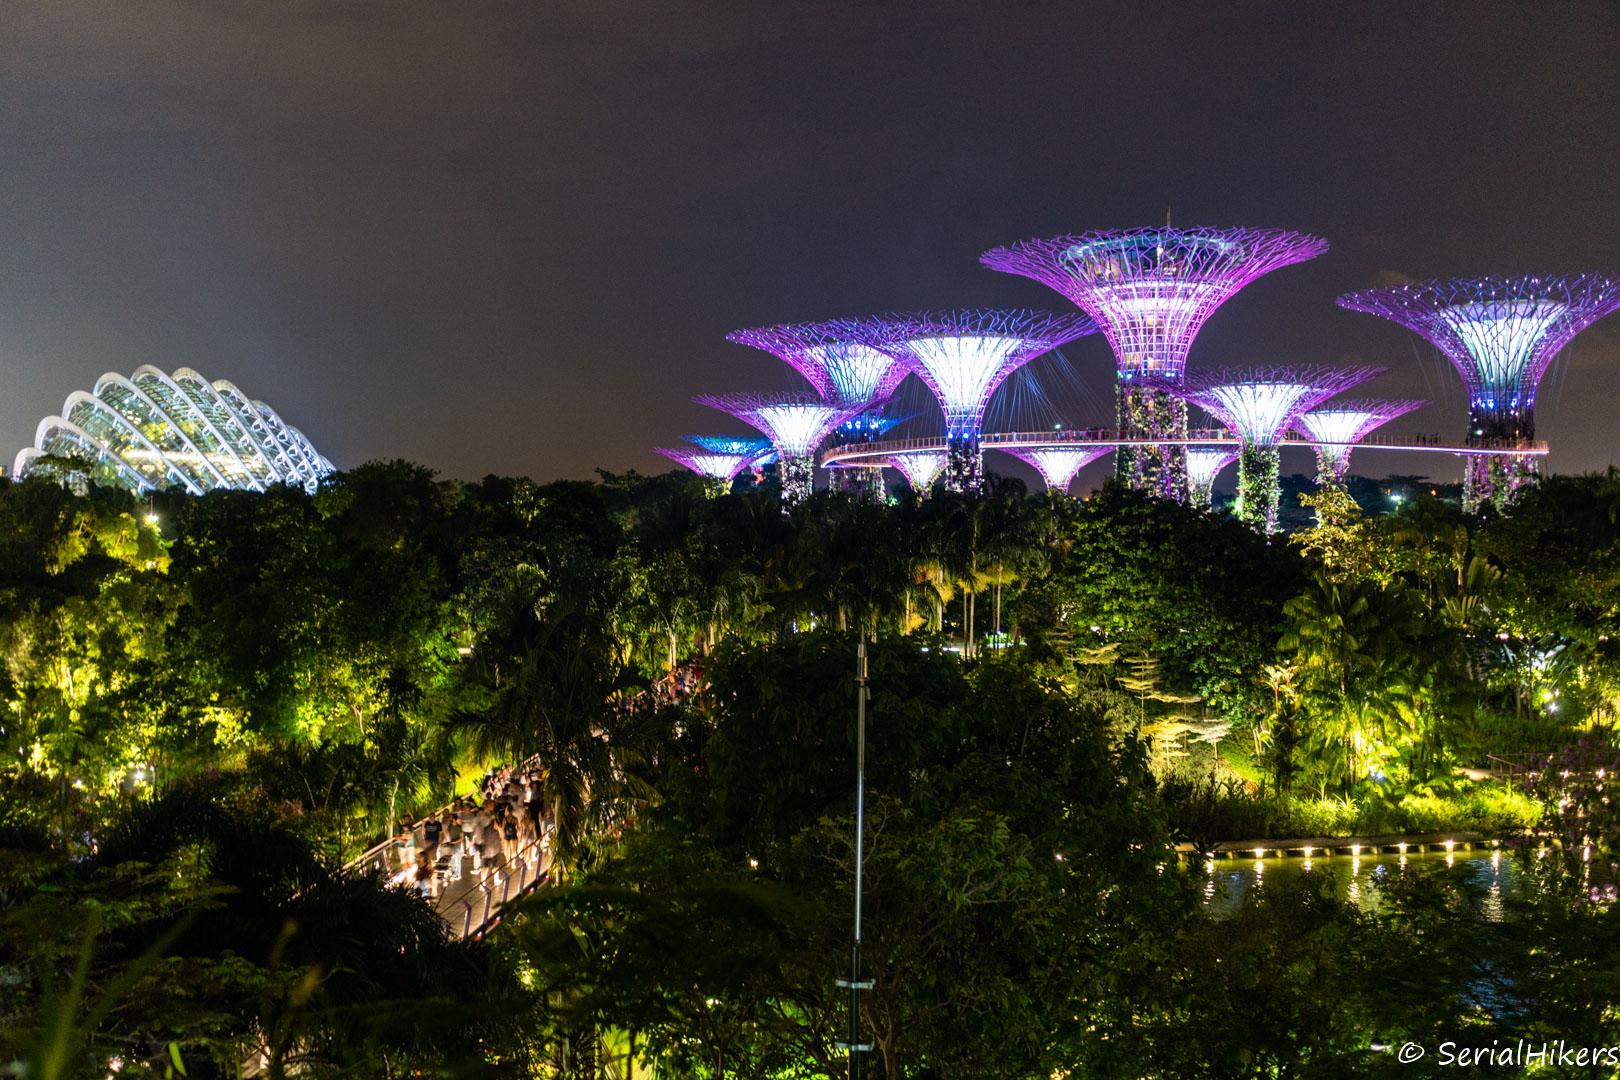 backpacking Jul&Gaux SerialHikers stop autostop world tour hitchhiking aventure adventure alternative travel voyage volontariat volonteering singapour singapore destination bay gardens light show